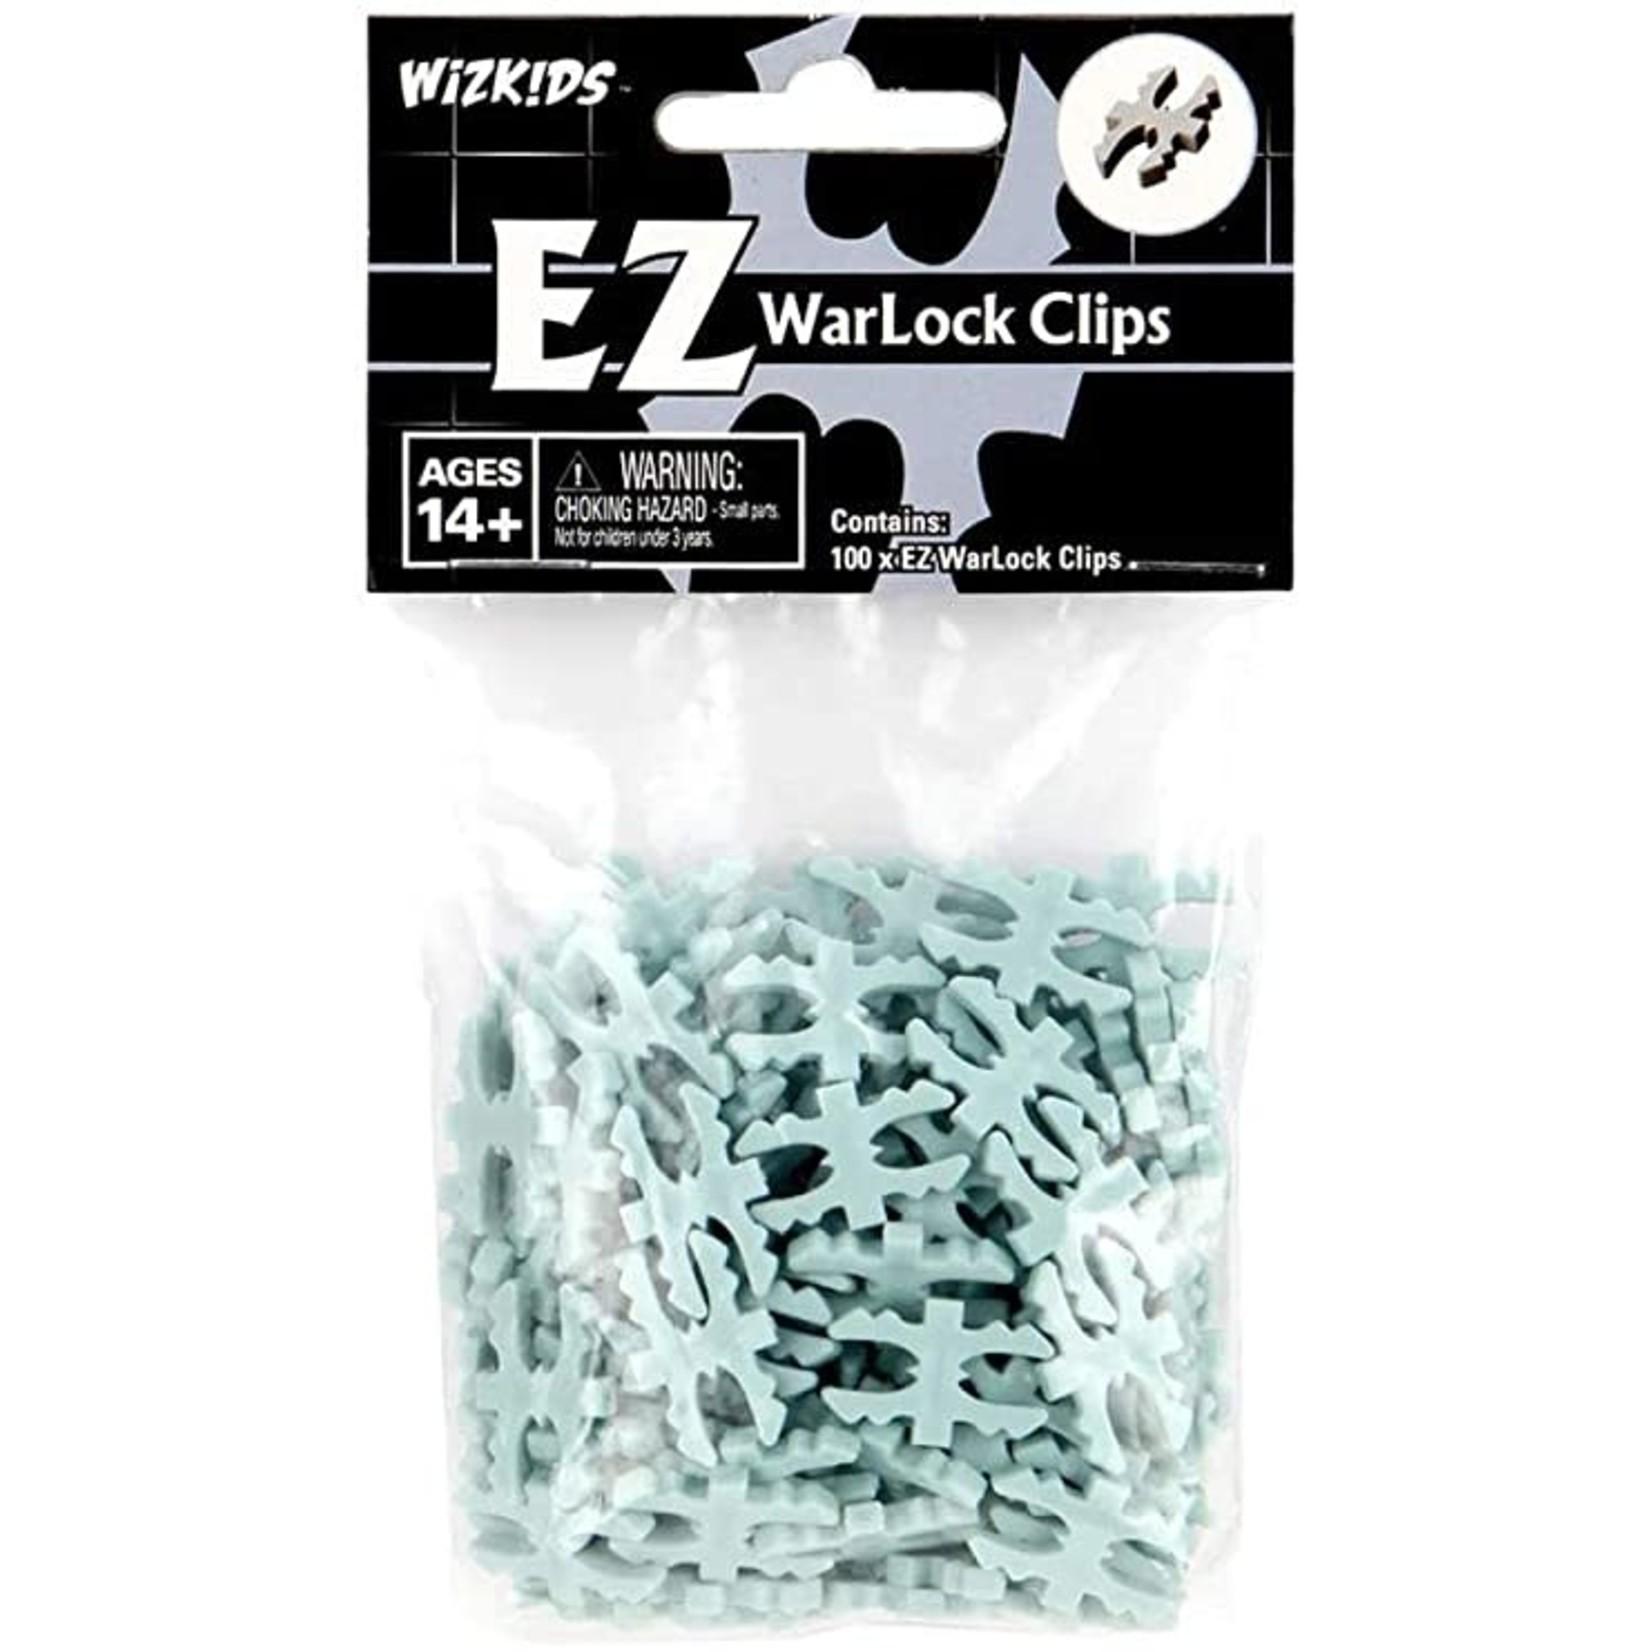 WizKids Wizkids D&D WarLock Tiles: Warlock EZ Clips